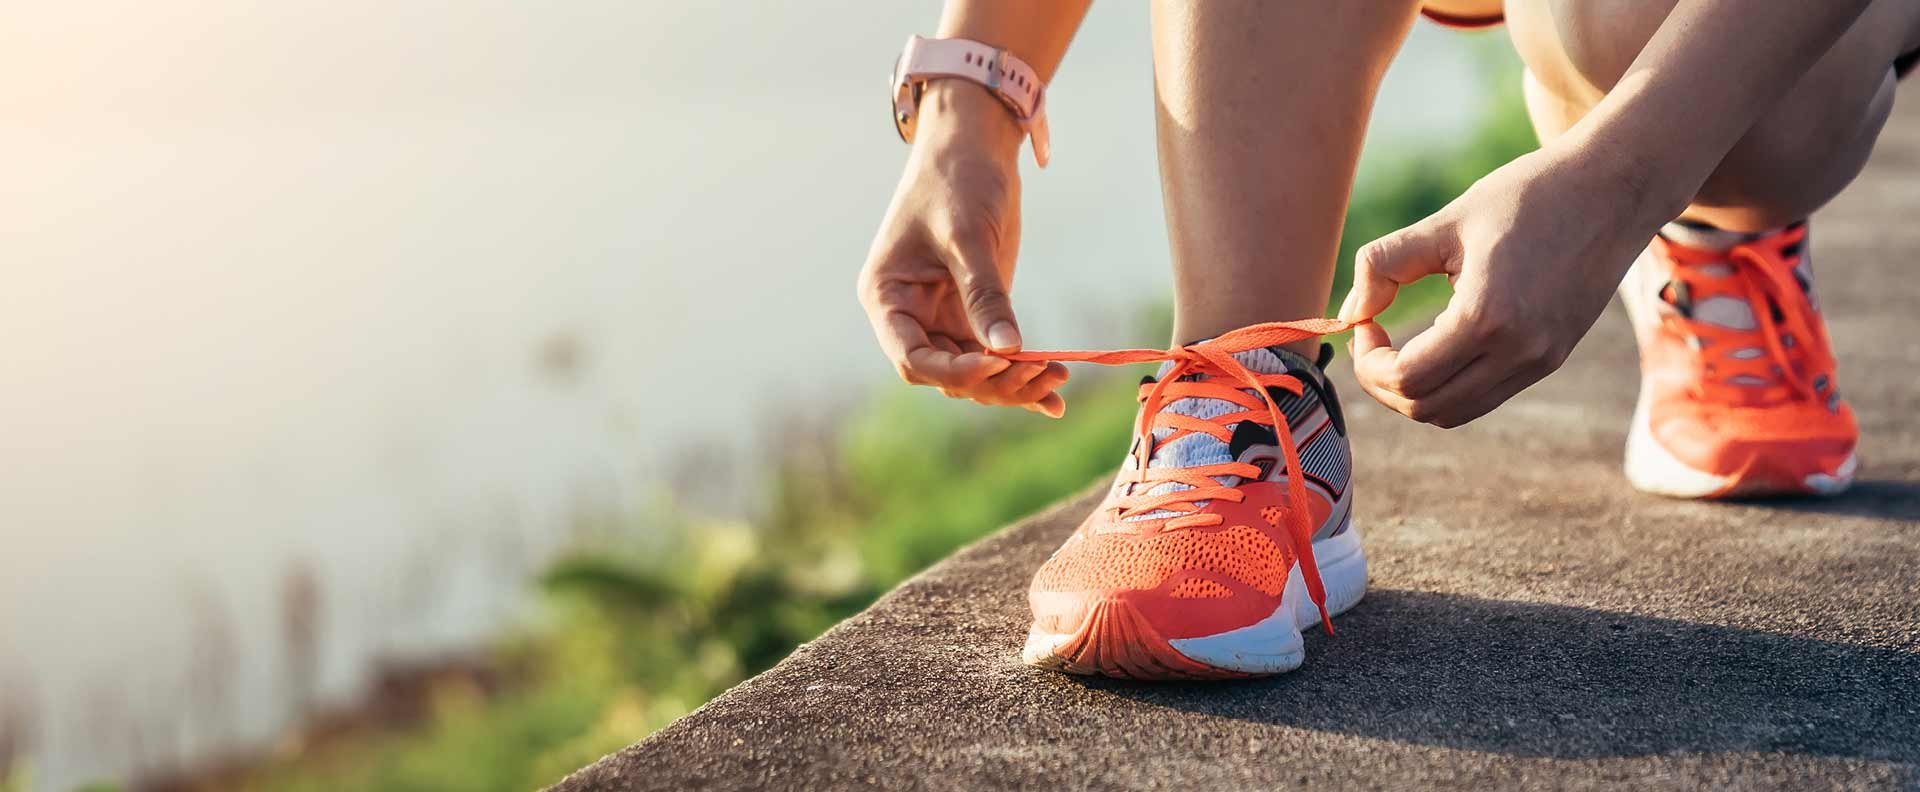 Runner bending down to tie sneaker